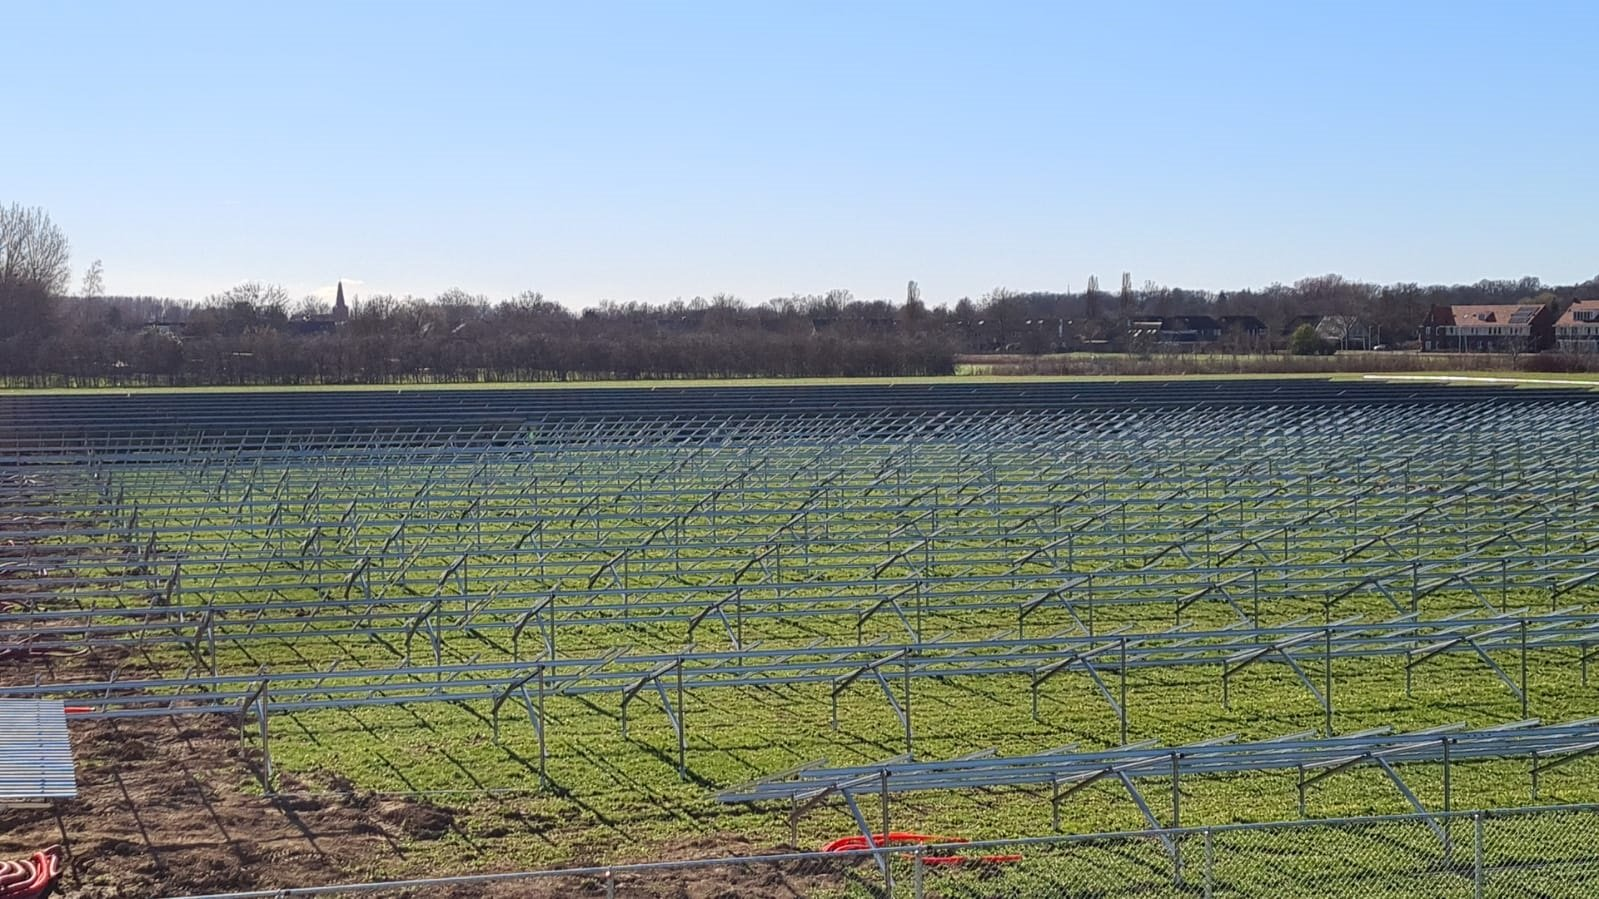 Zonnepark Elzenbos in april in bedrijf